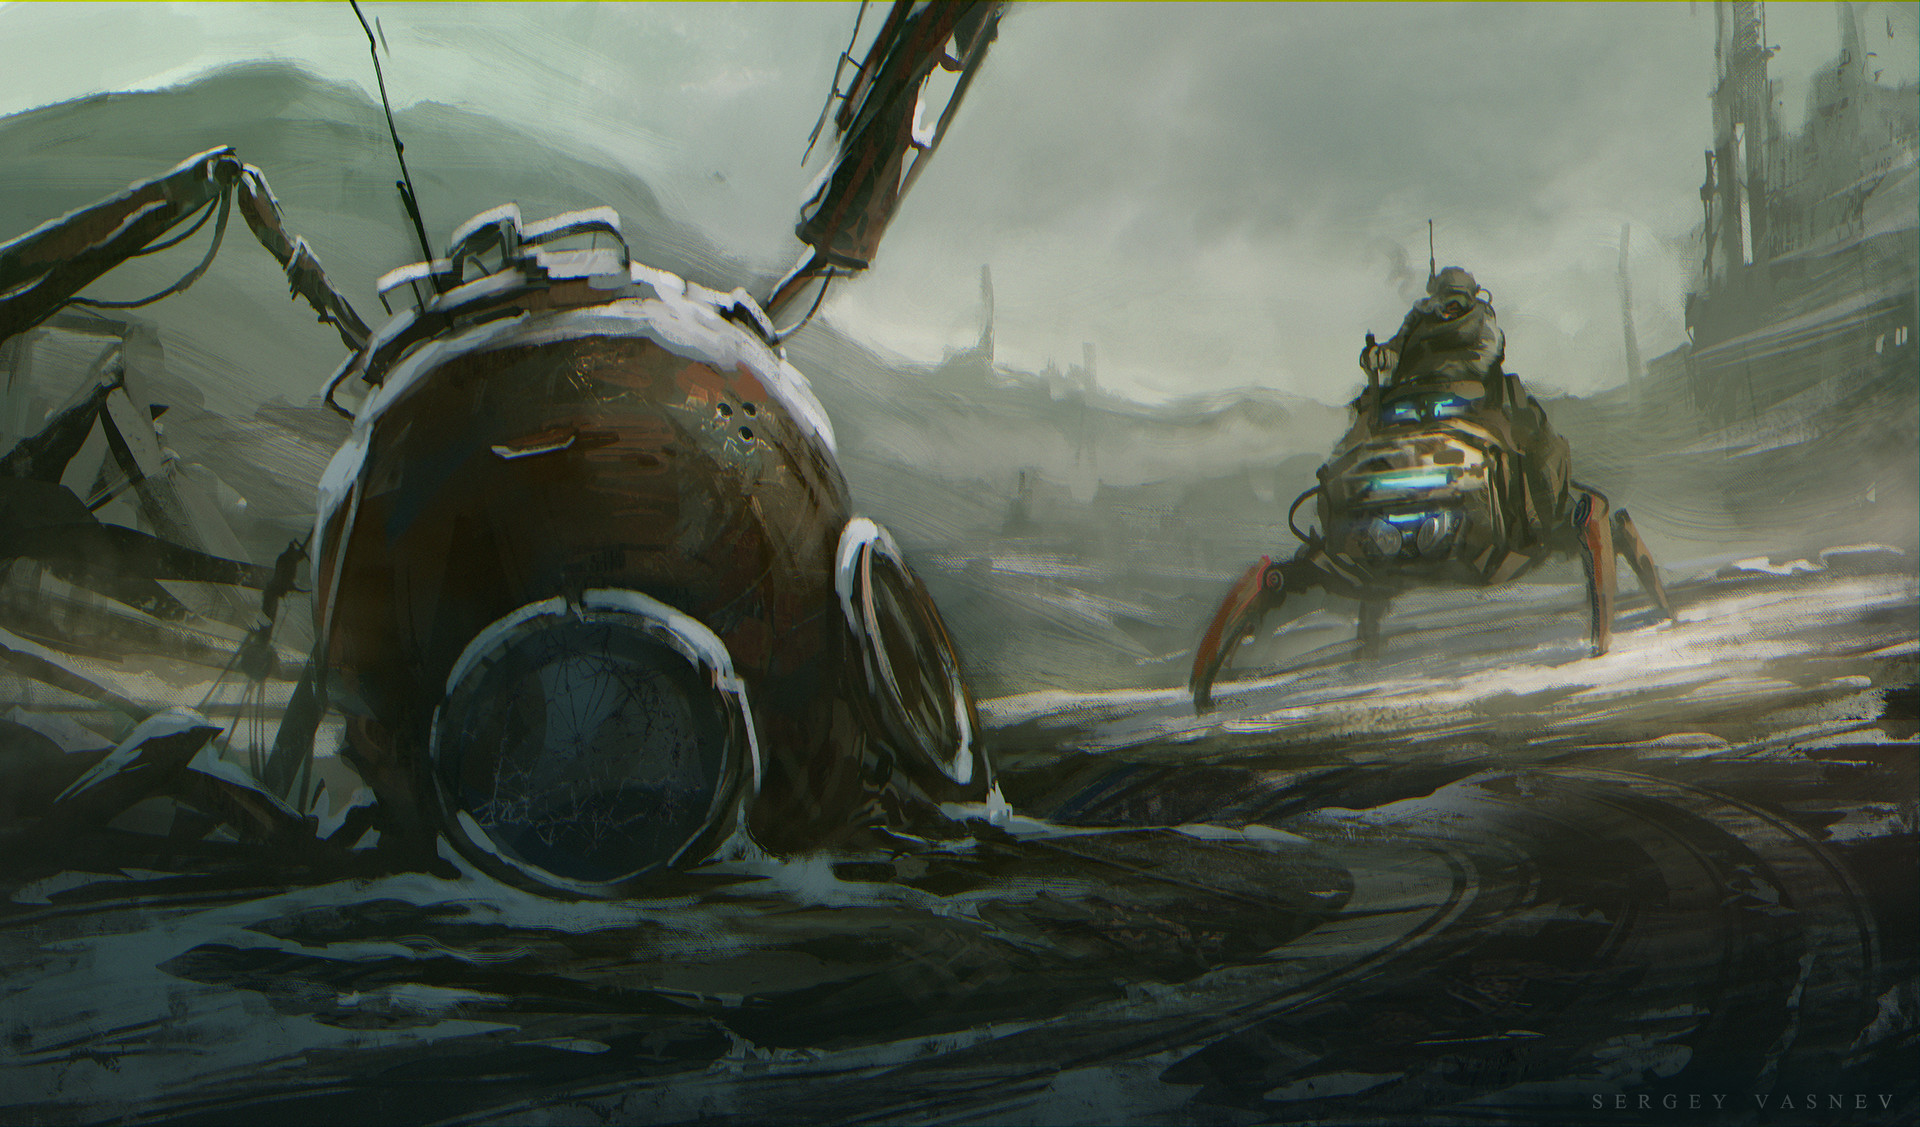 Sergey vasnev dog robot3